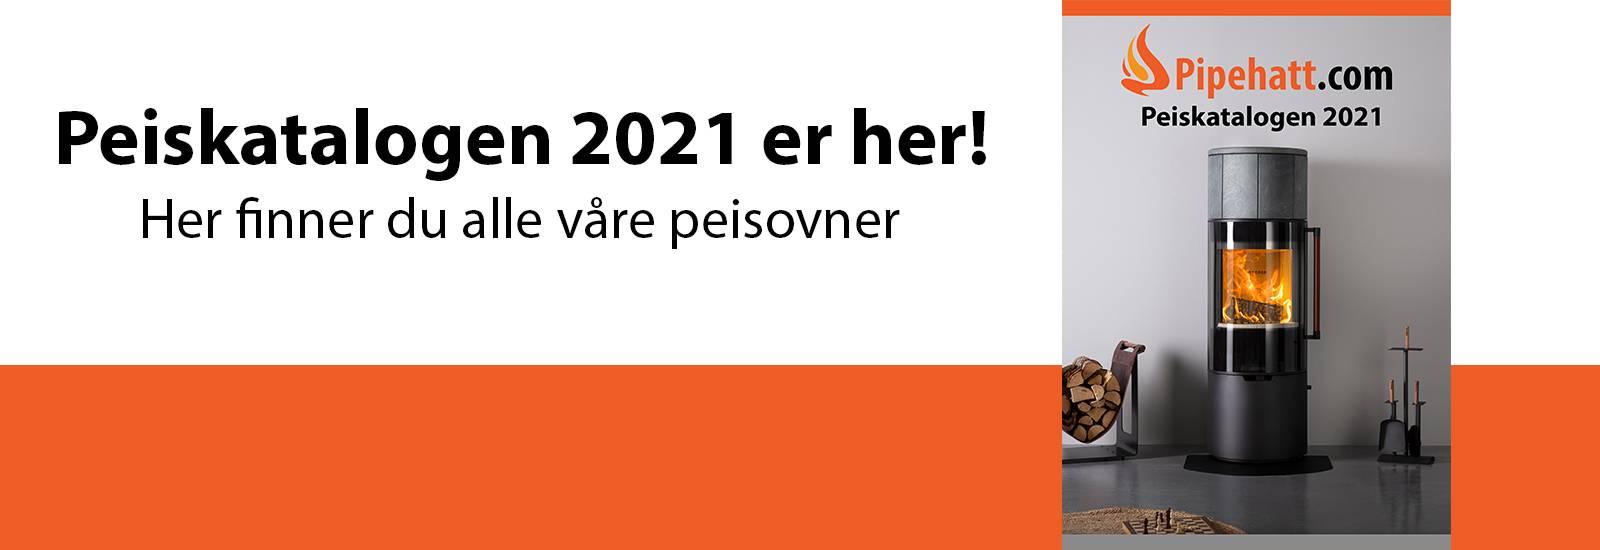 Peiskatalogen-2021